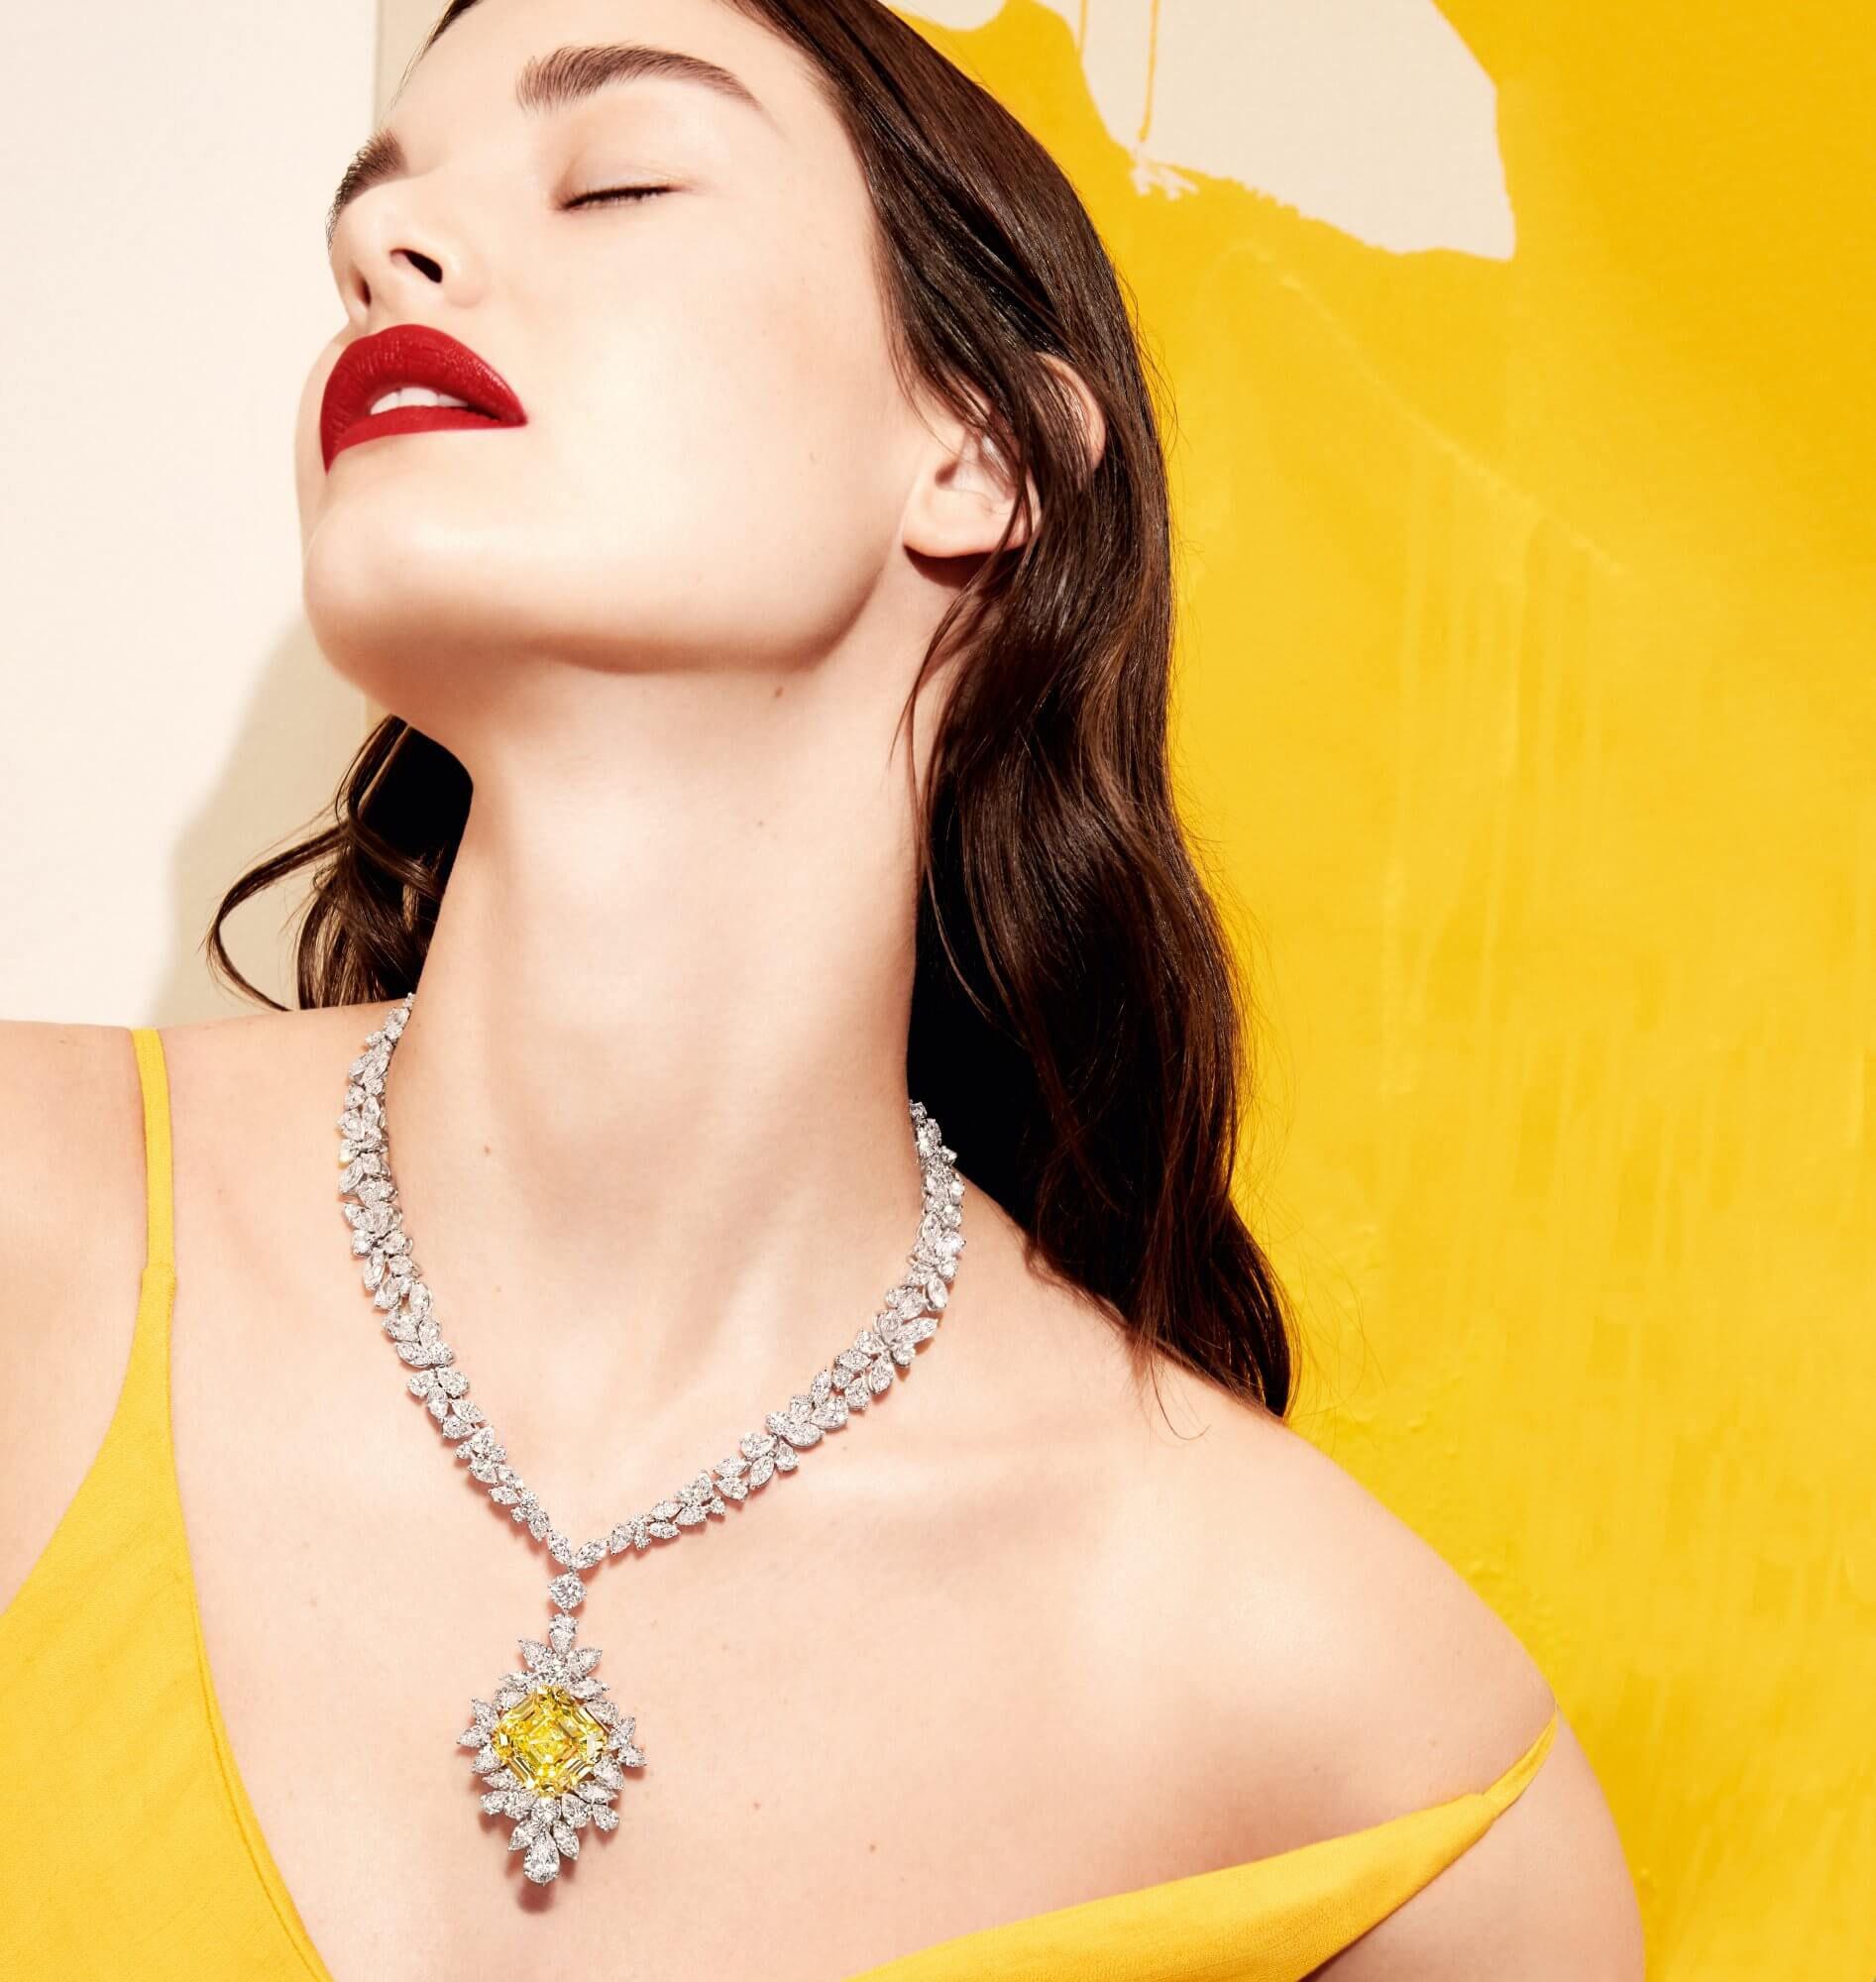 Model wears Graff yellow and white diamond high jewellery necklace featuring a 53.94 carat Fancy Intense Yellow emerald cut diamond